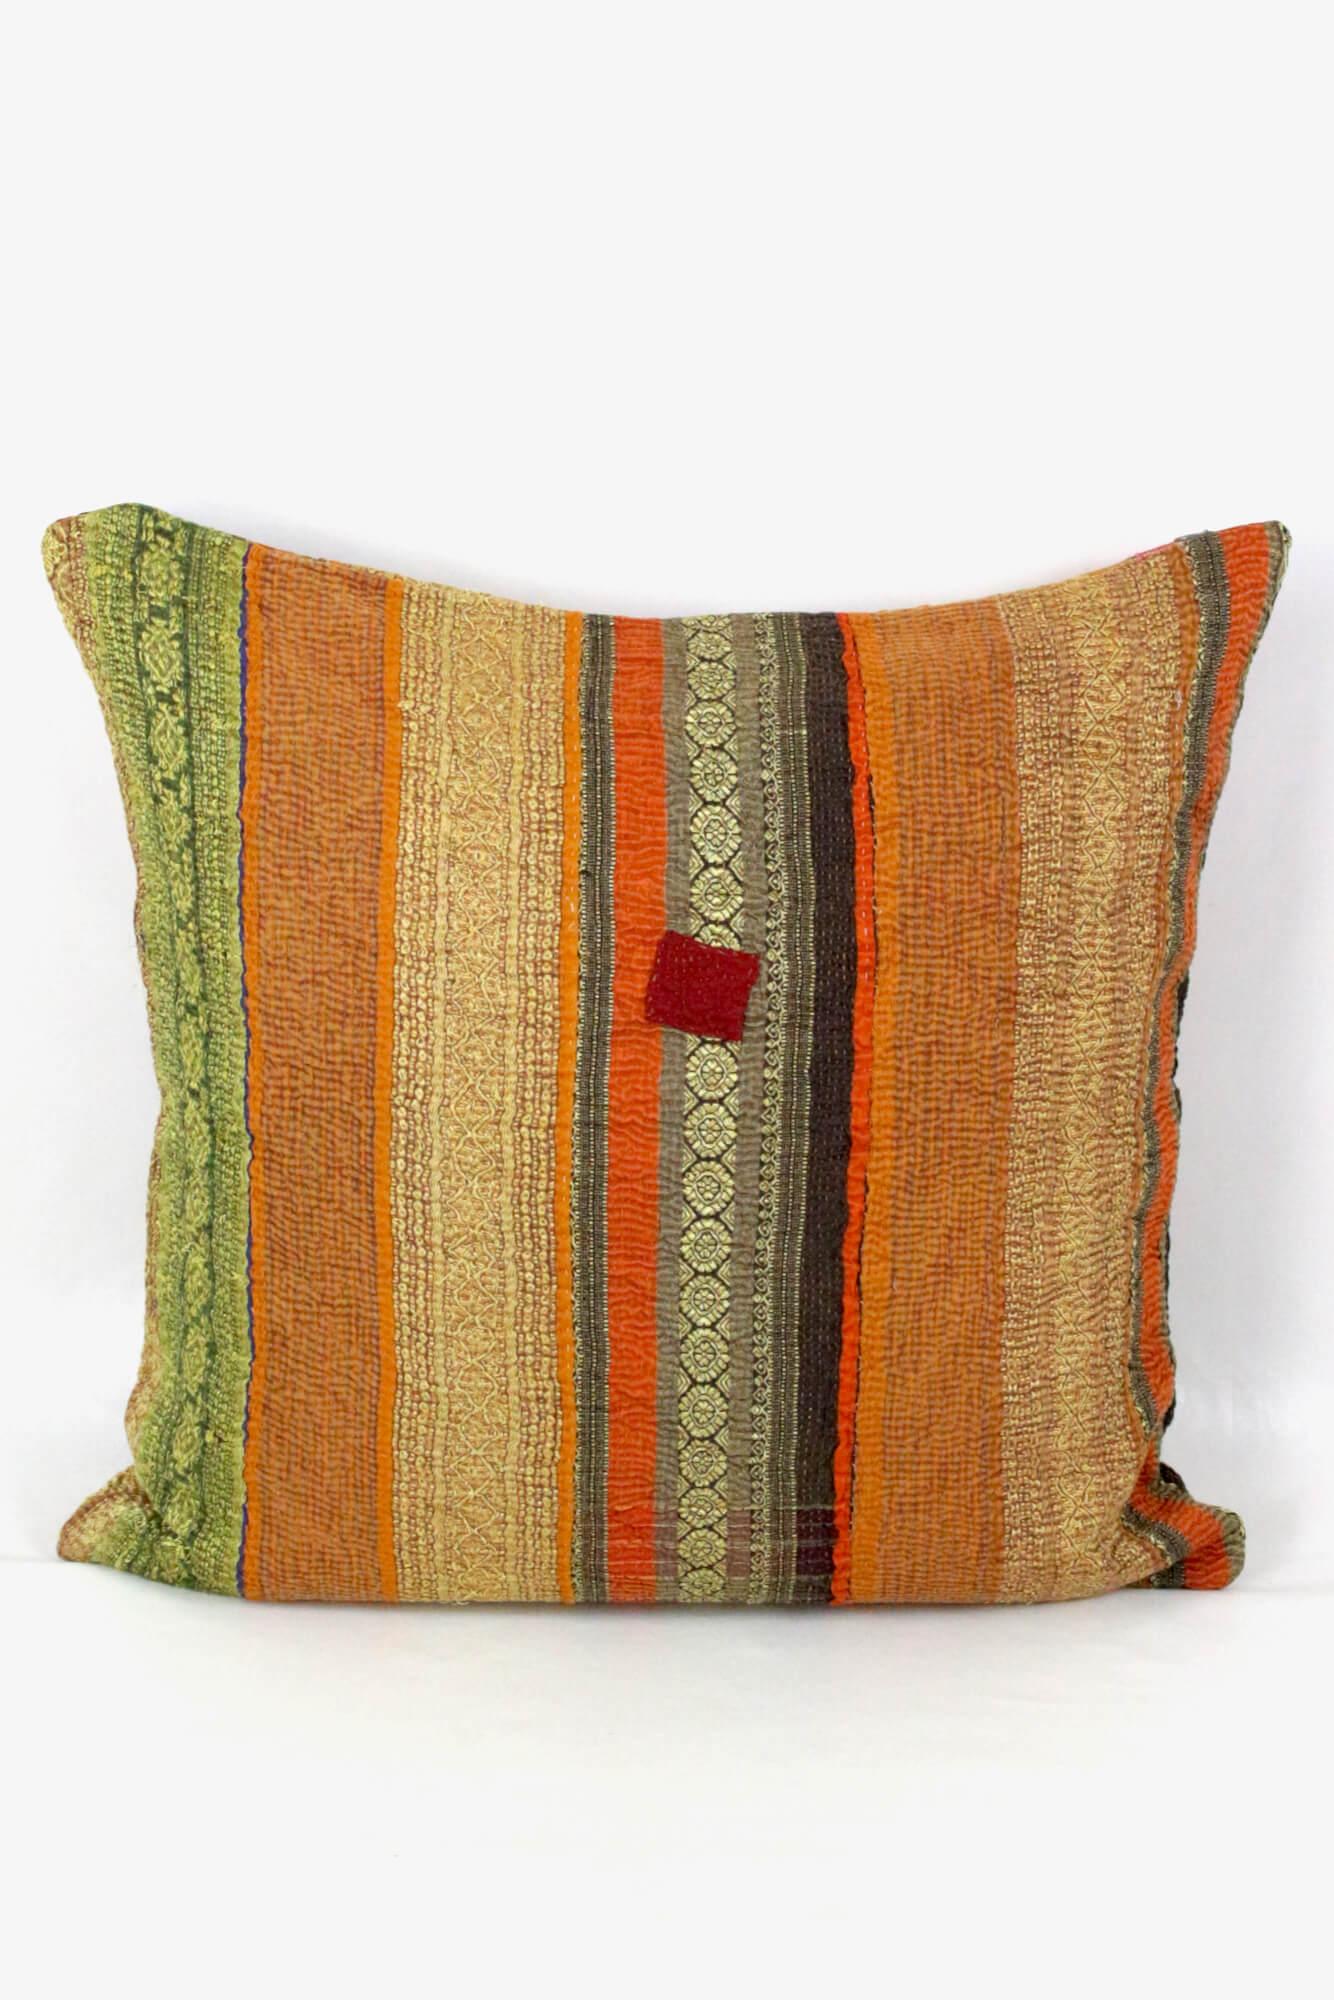 Buntes Boho Vintage Kissen Baumwolle, 60x60